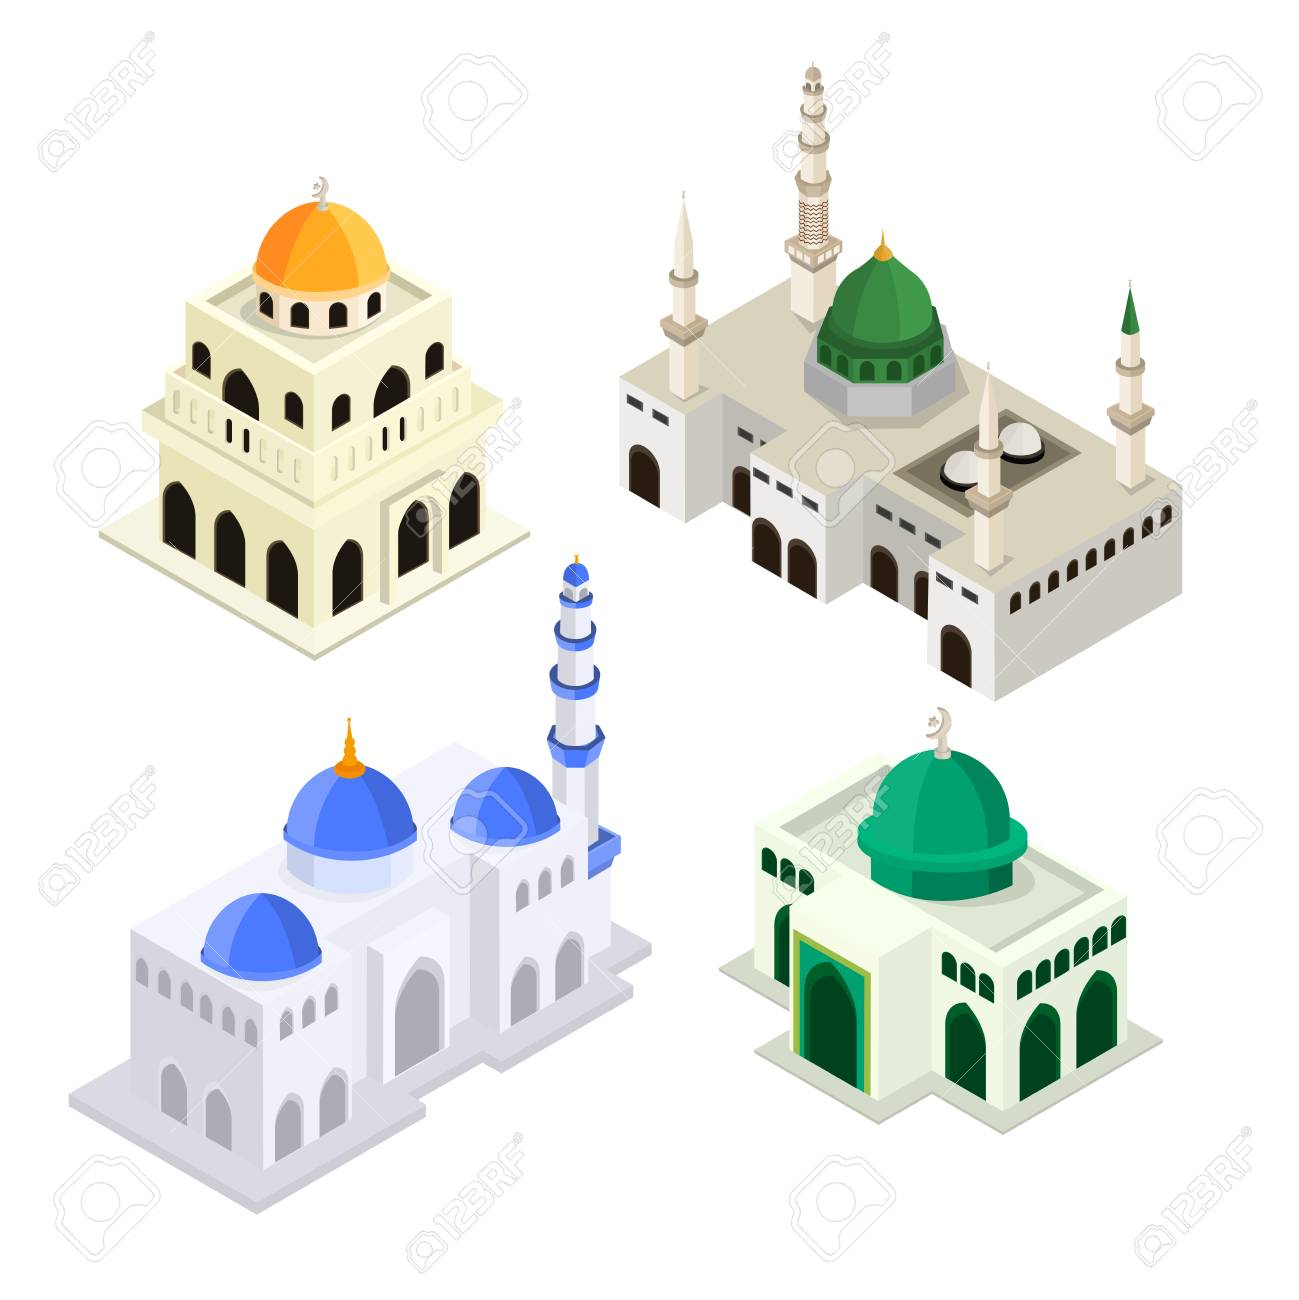 Icon masjid 3d